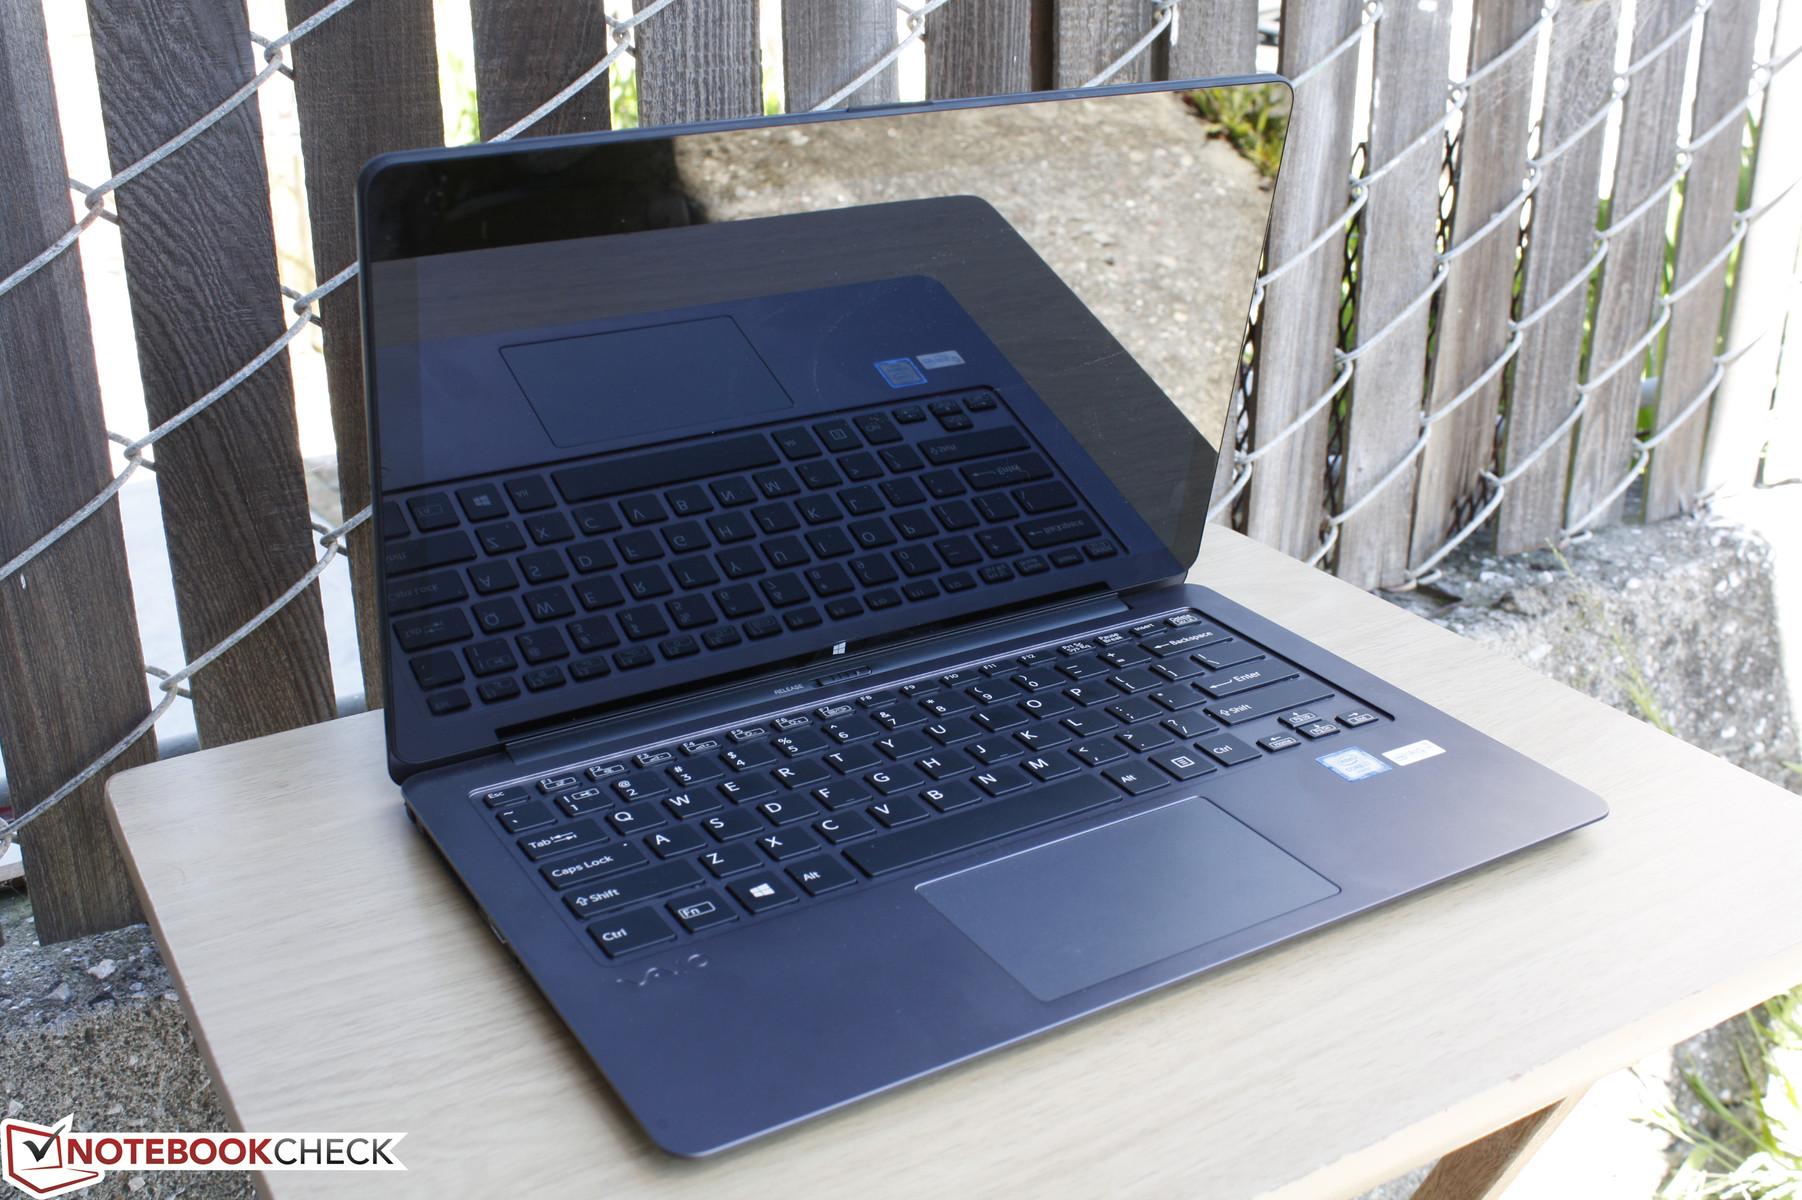 Face Off Asus Zenbook Ux360ua Vs Hp Spectre X360 13 Vaio Z Ae519tu Flip